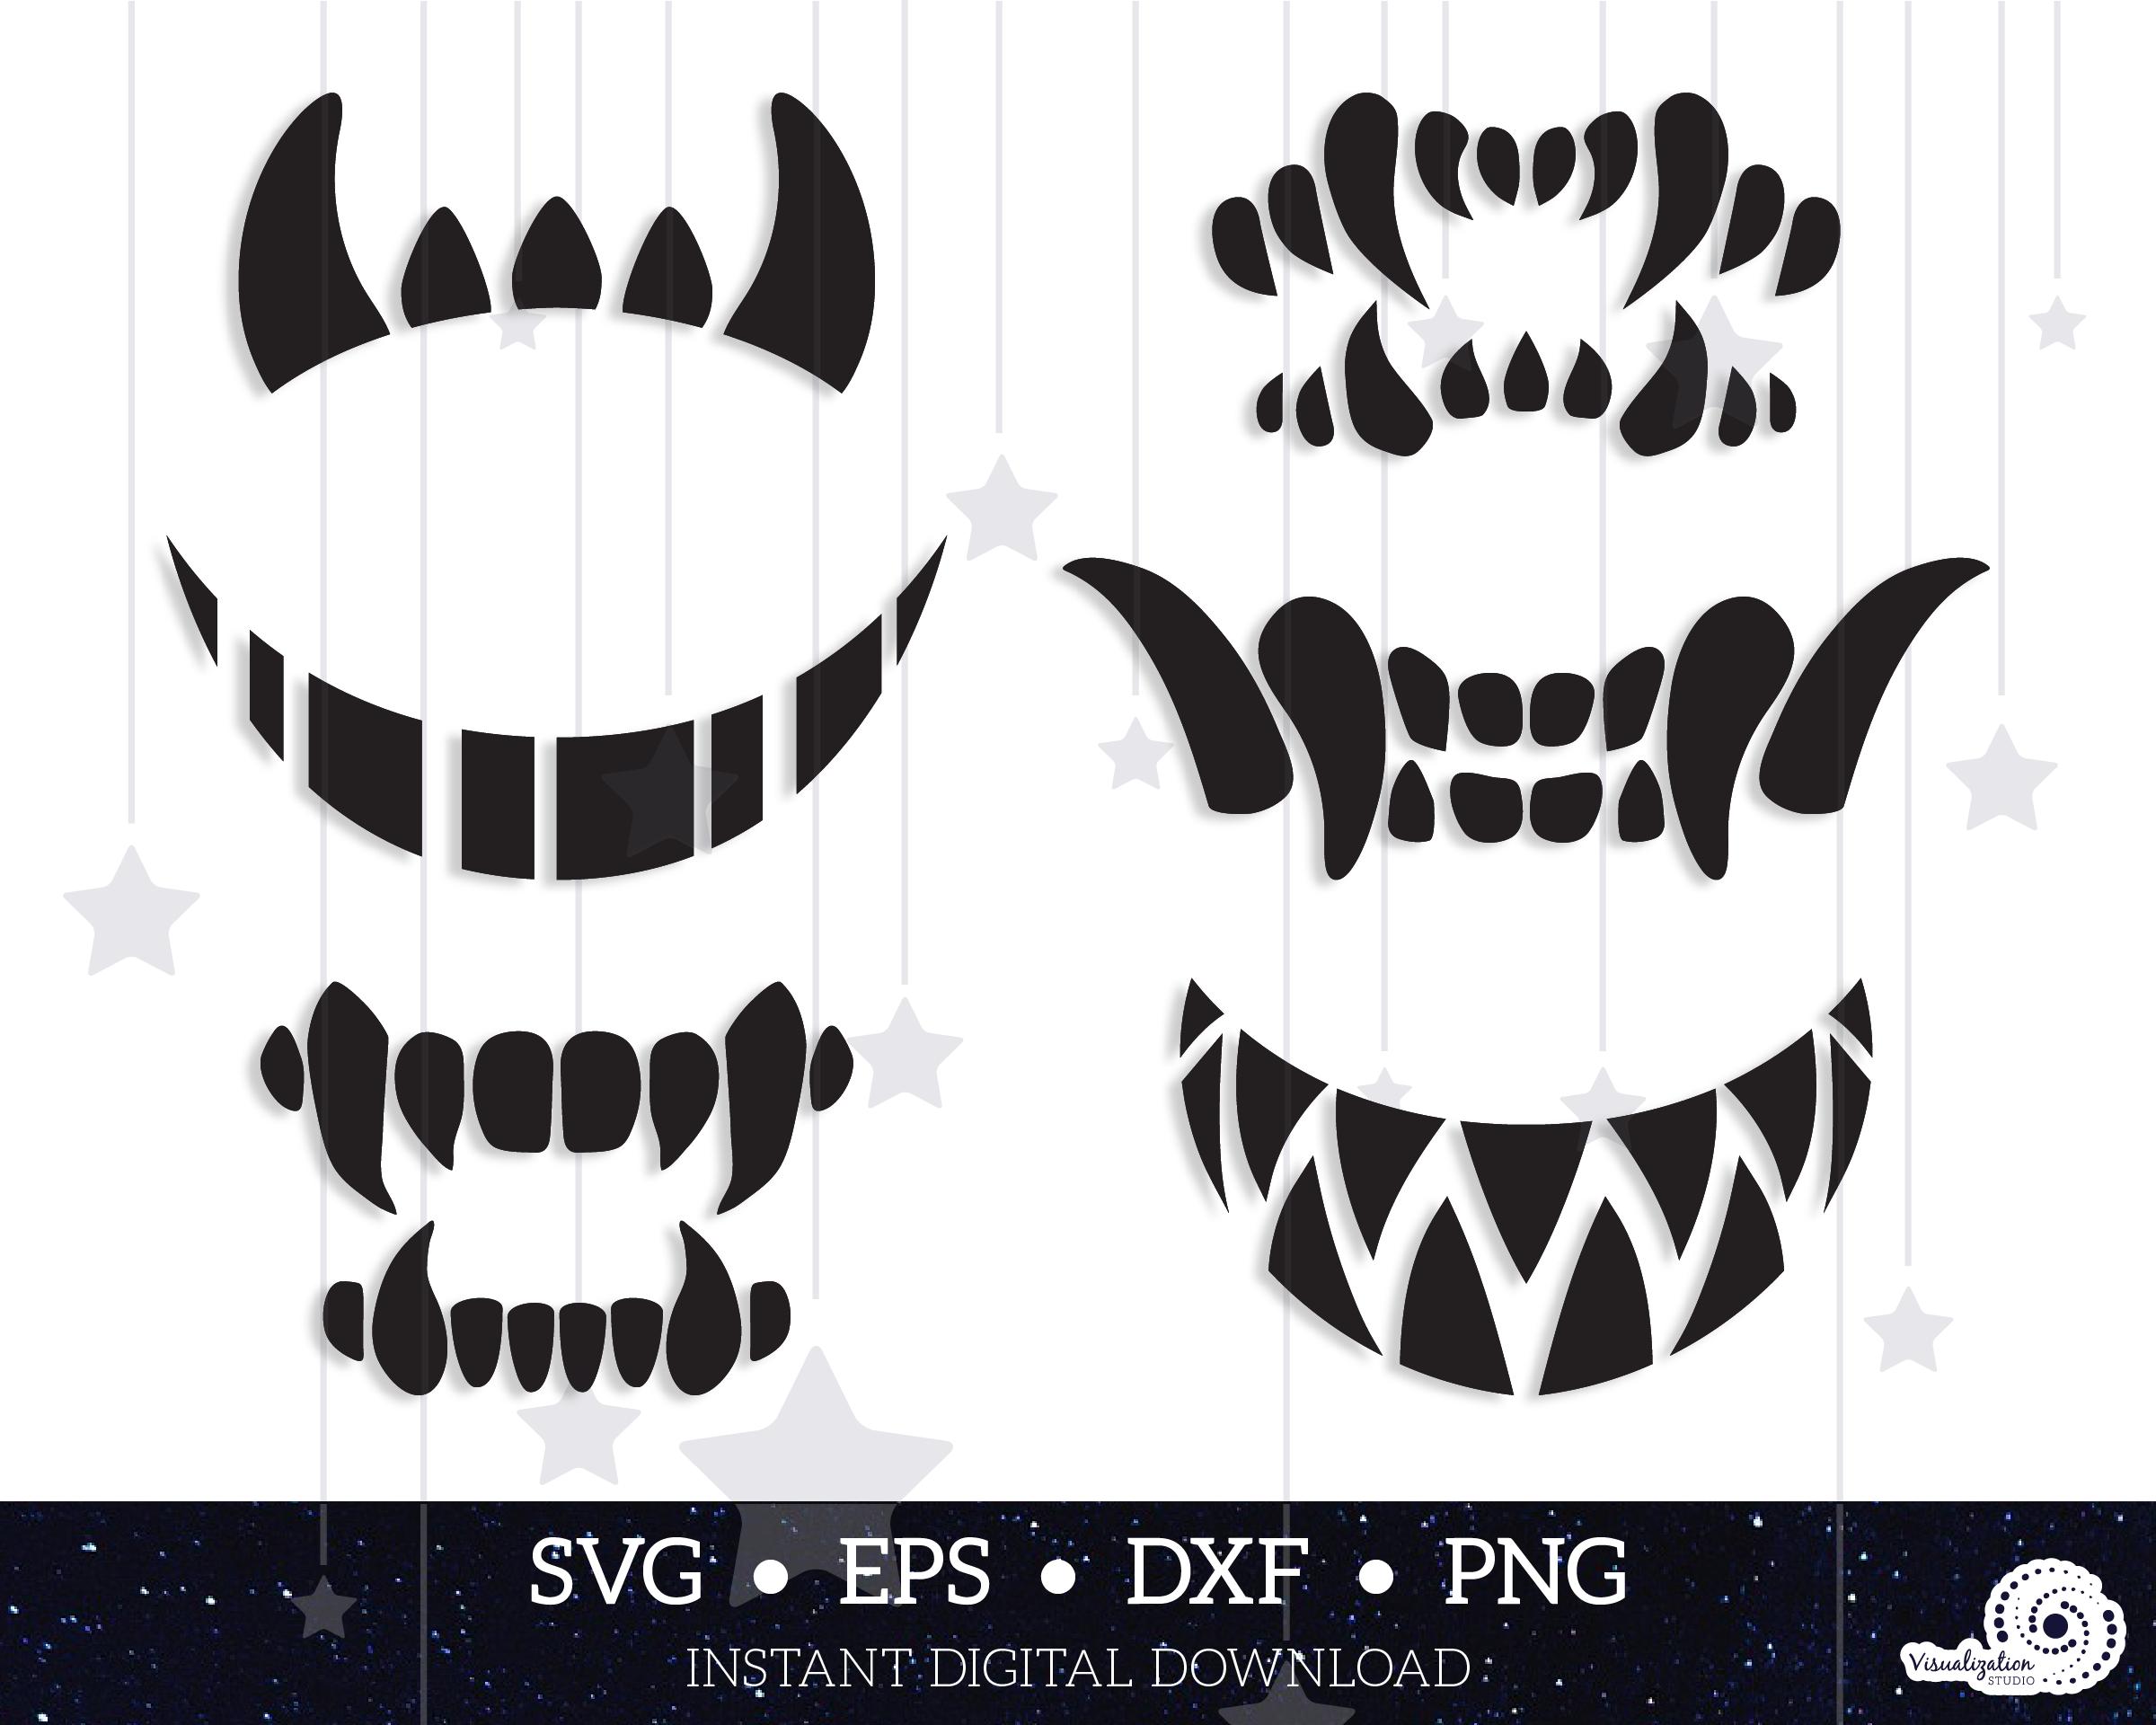 Scary Fangs And Teeth Halloween Vector Set Instant Digital Etsy In 2020 Halloween Vector Halloween Face Mask Diy Mask